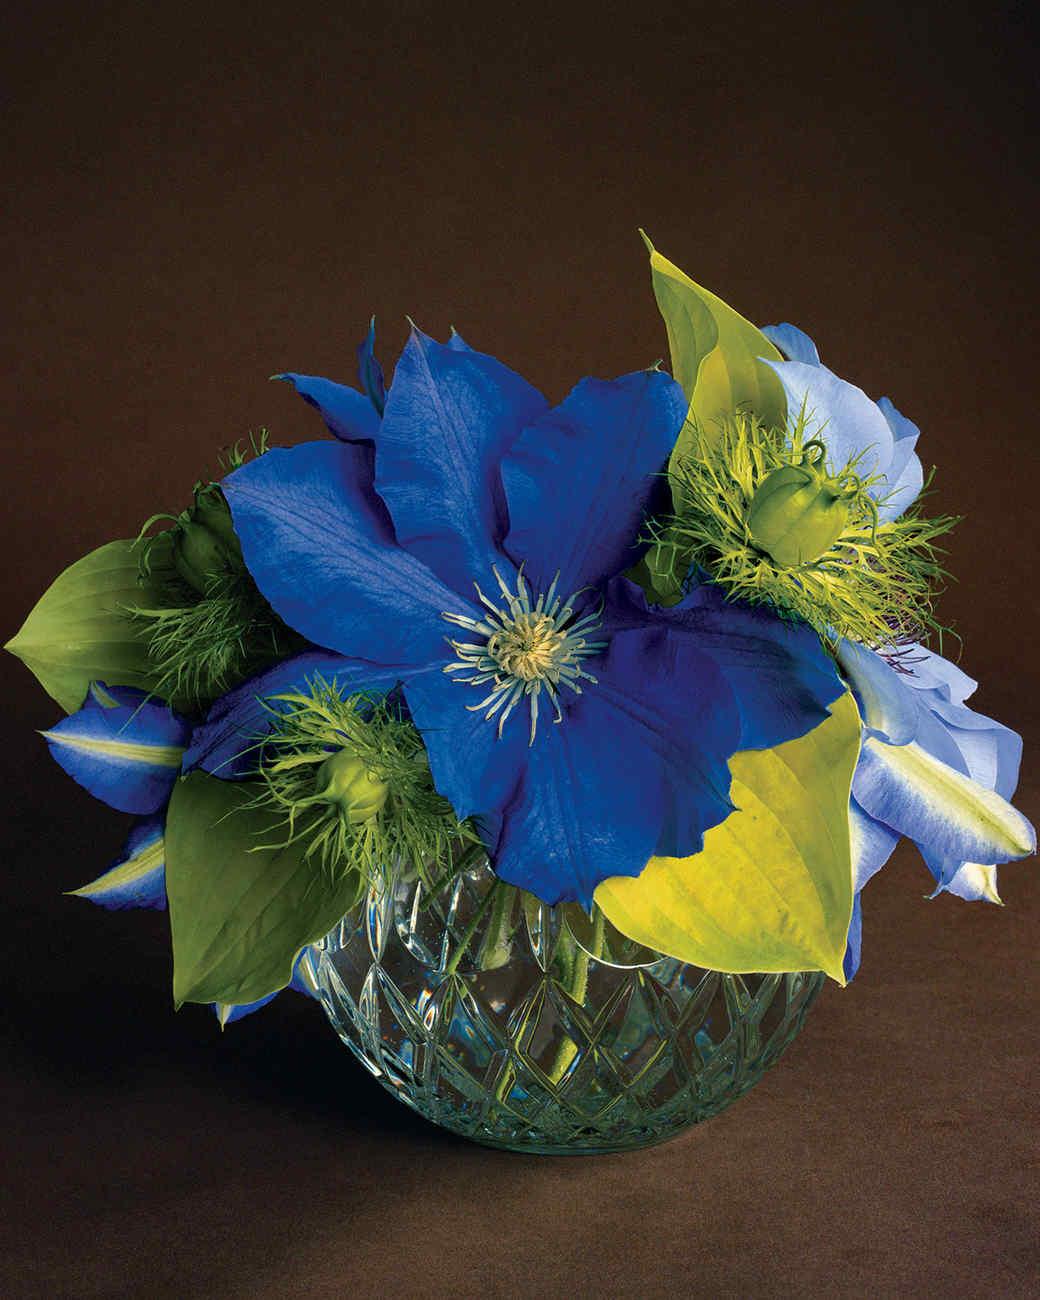 ma104989_0111_29b_flower.jpg